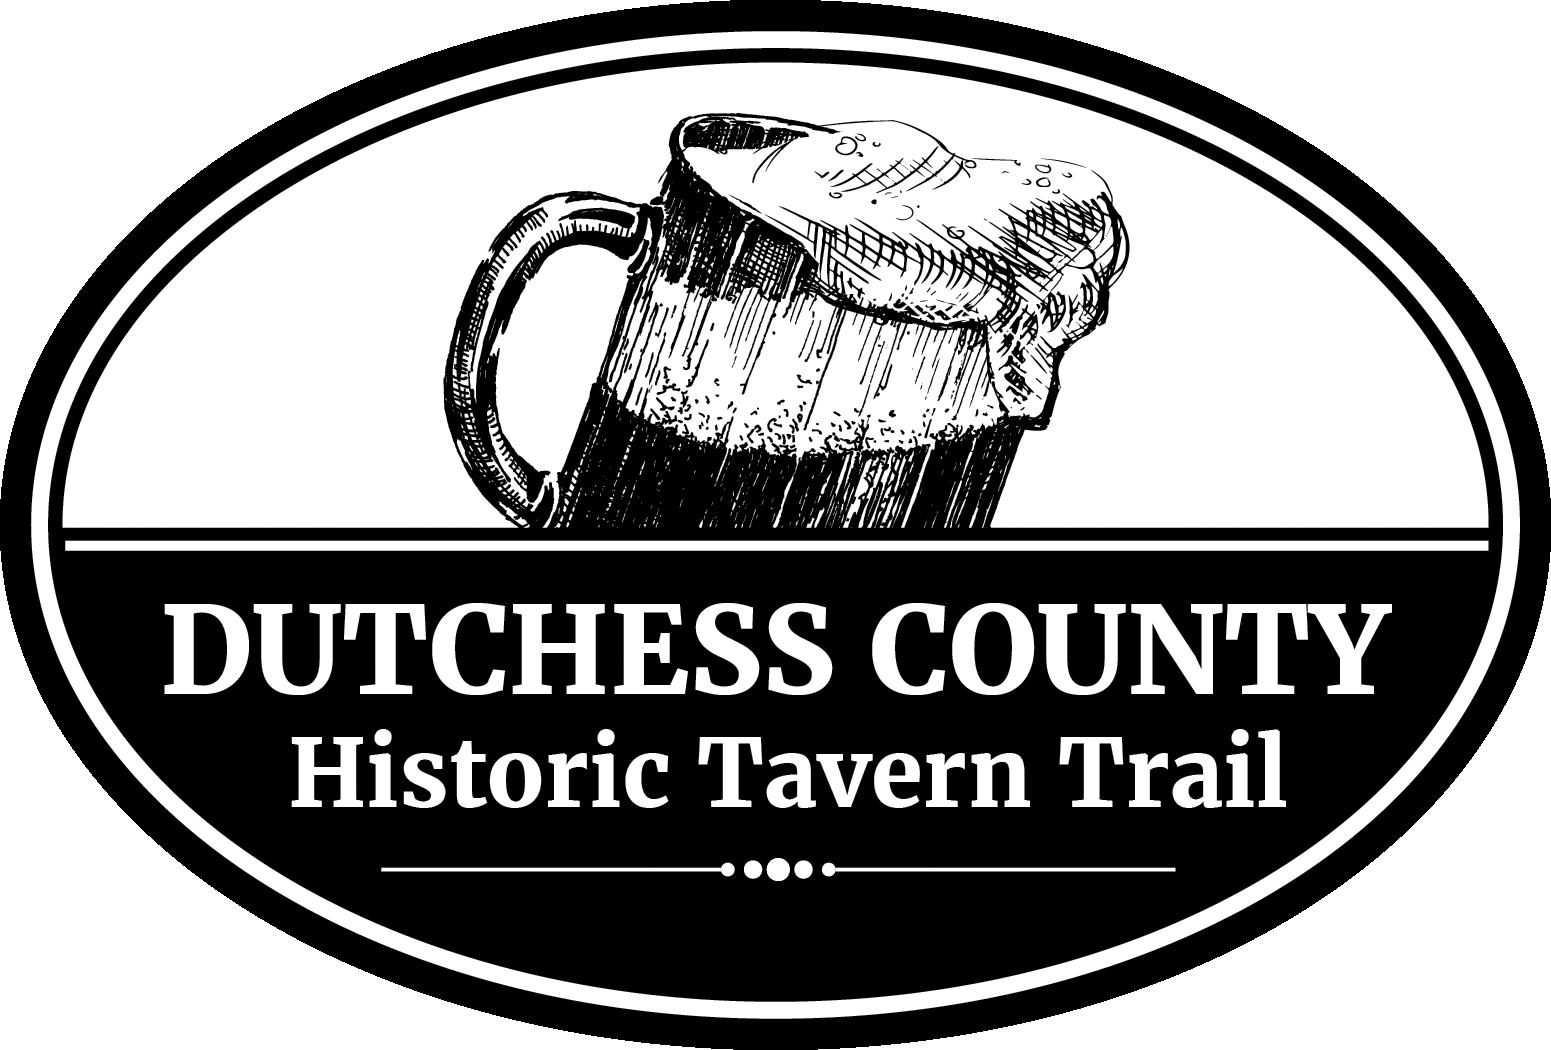 Historic Tavern Trail logo